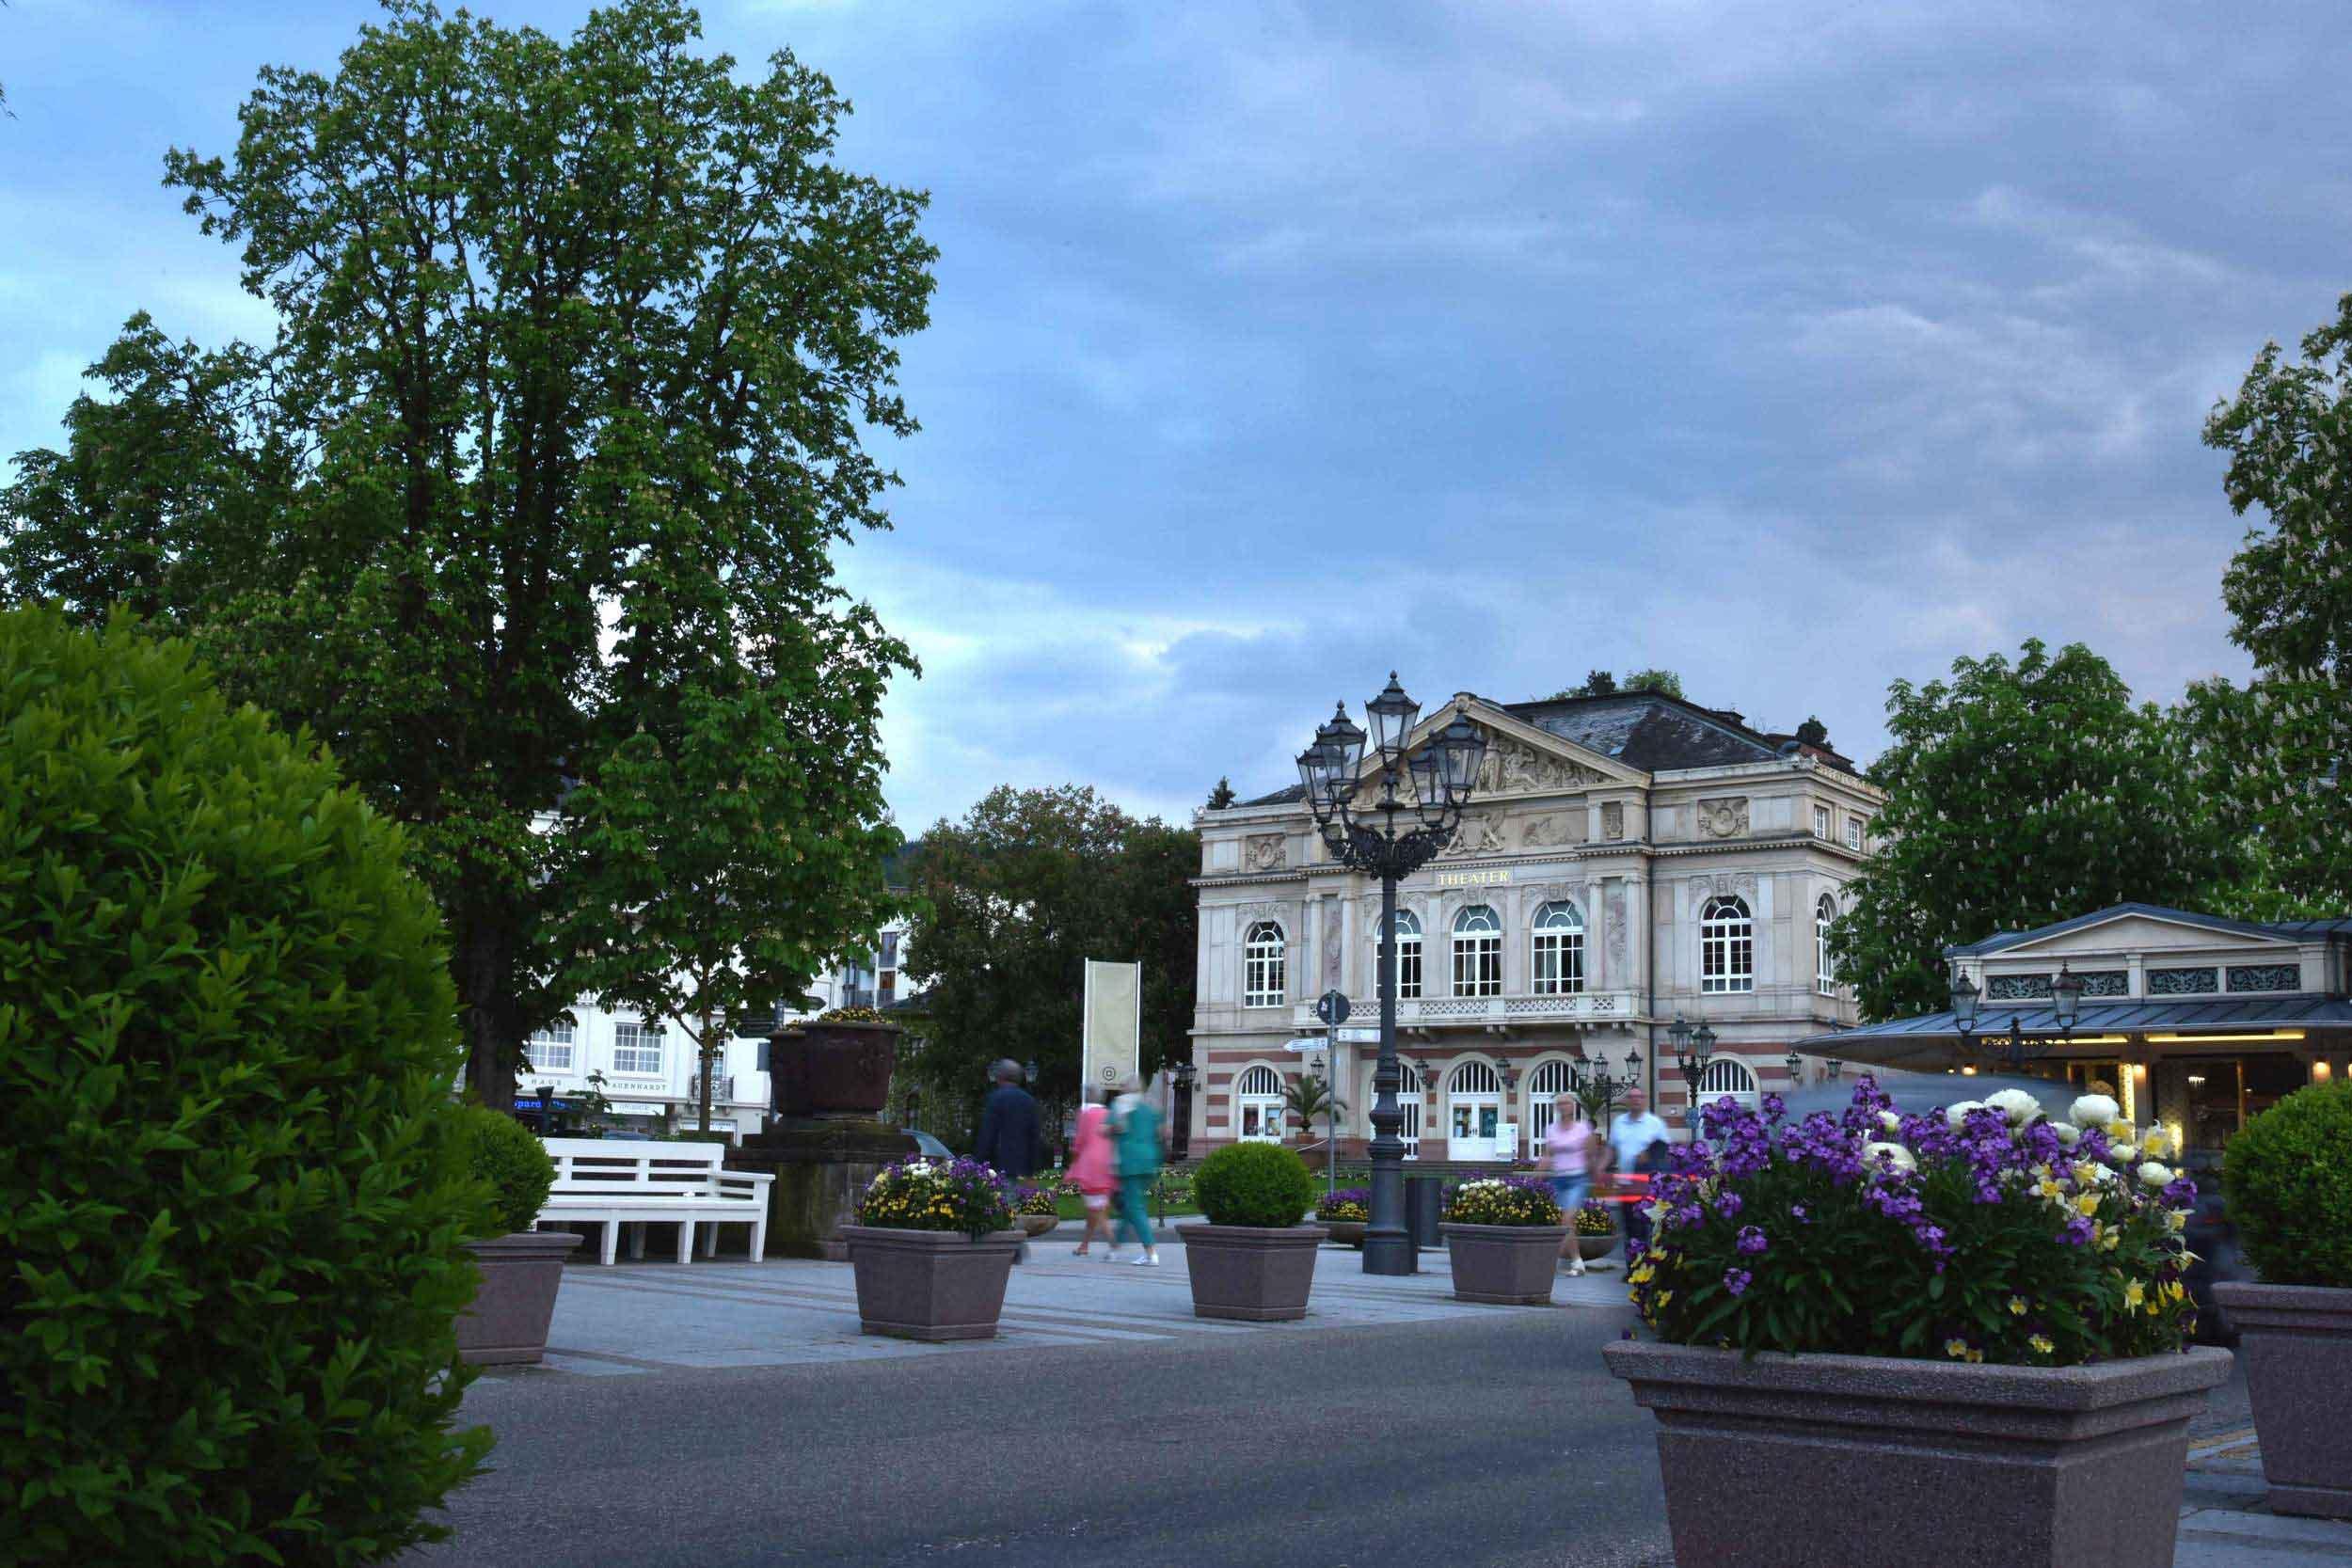 Theater, Baden Baden, Germany. Image©thingstodot.com